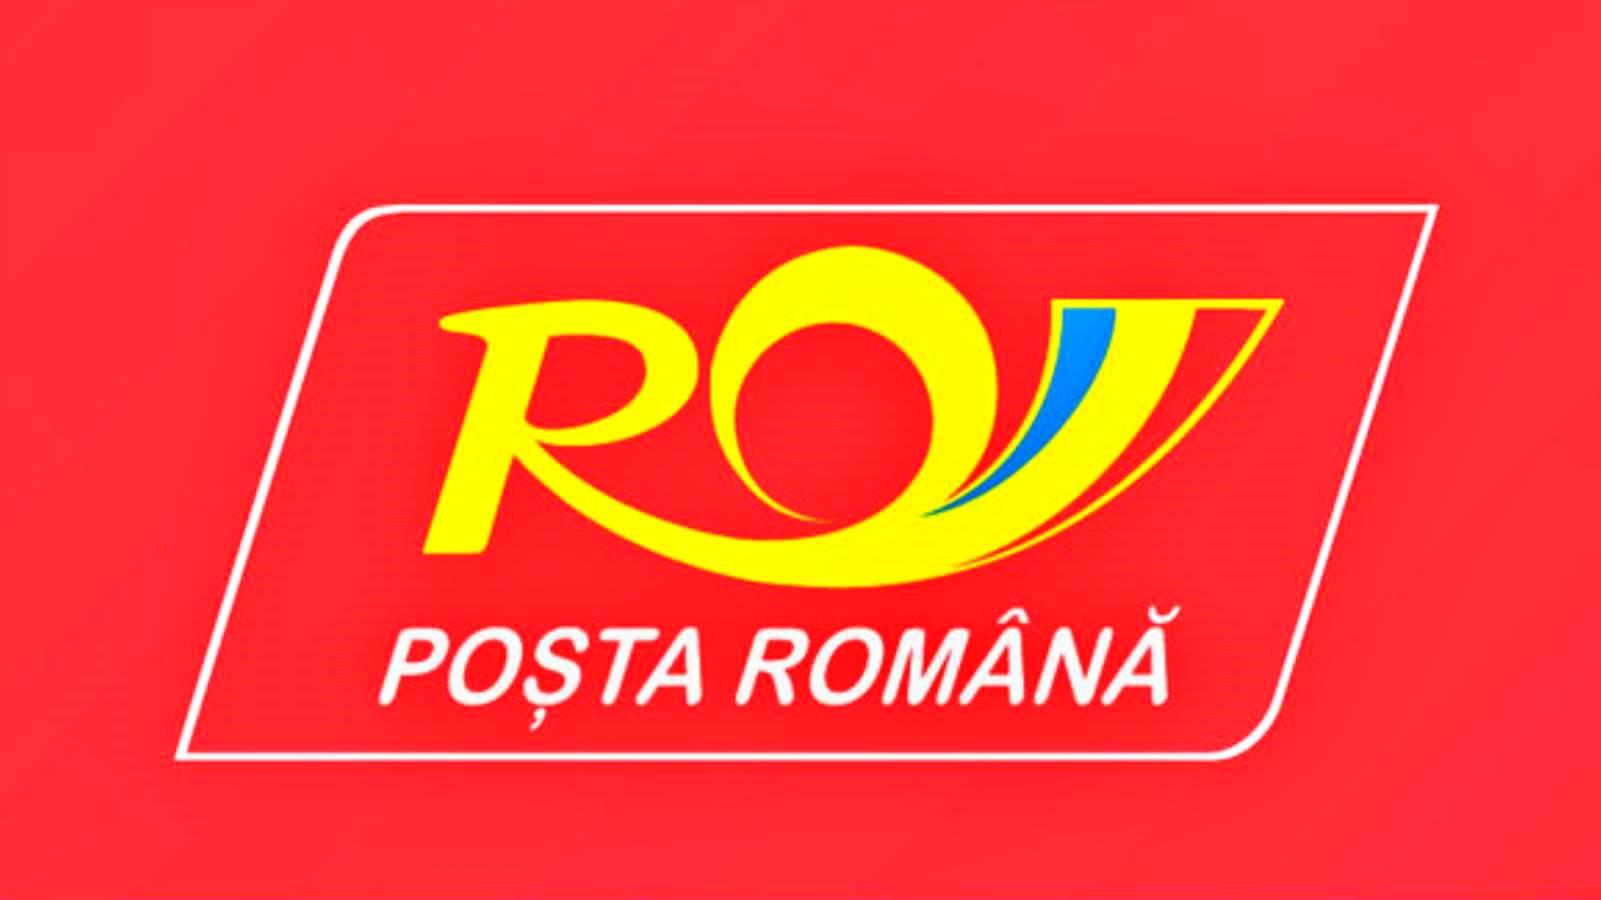 Posta Romana Lista Obiectelor Interzise Expeditie